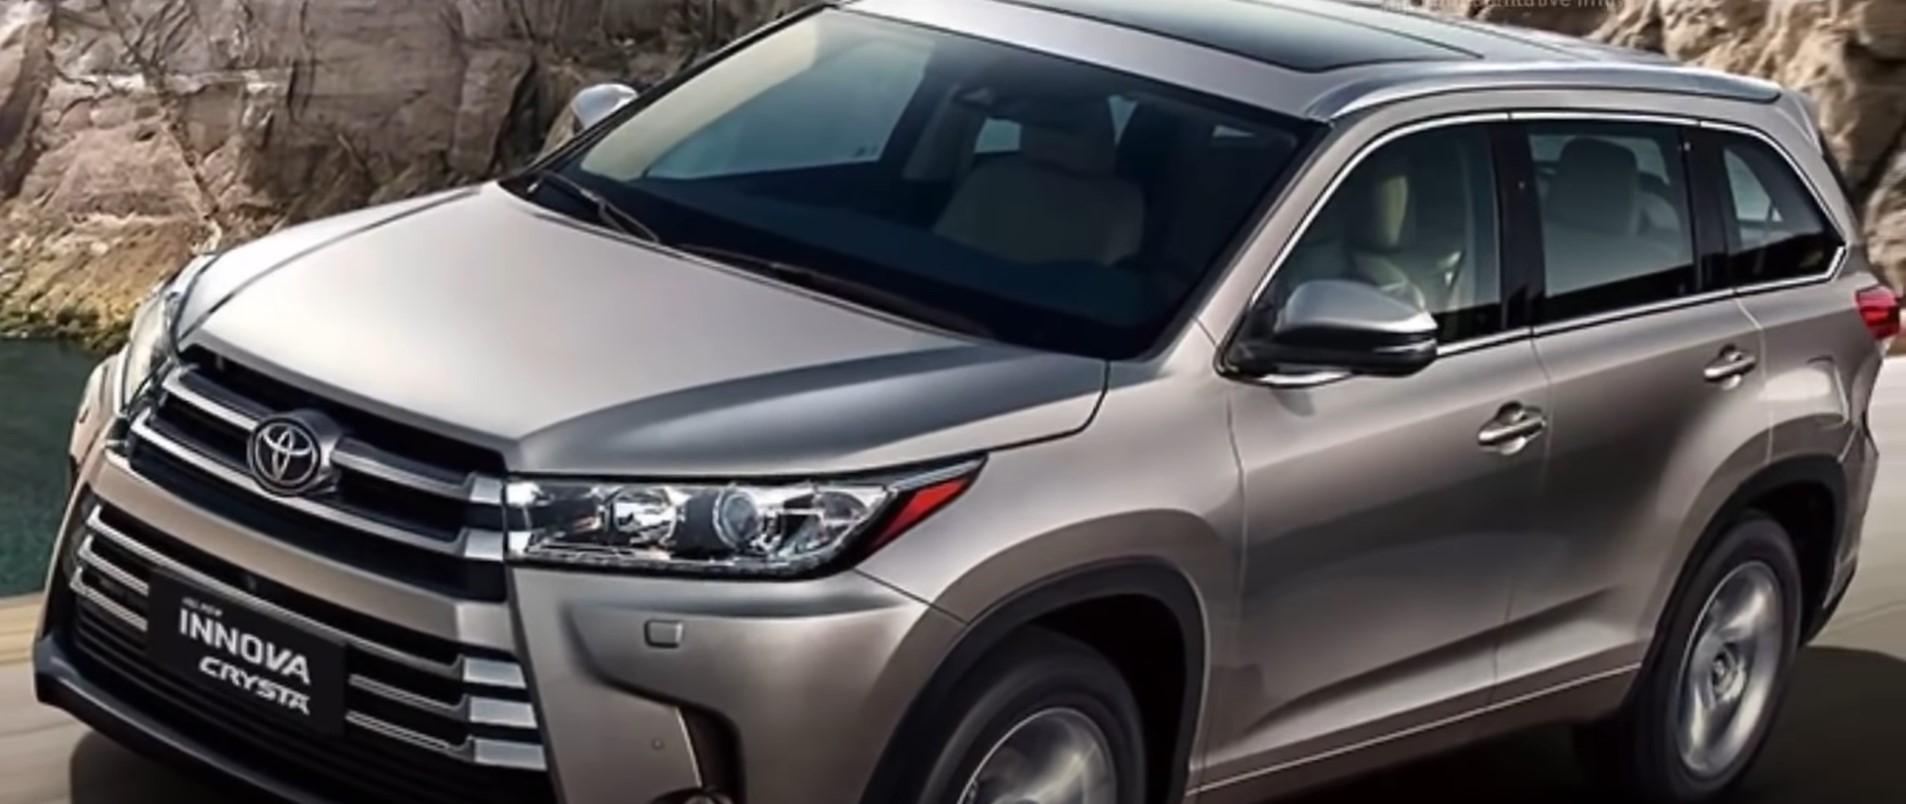 Tampilan Depan Toyota Innova Crysta